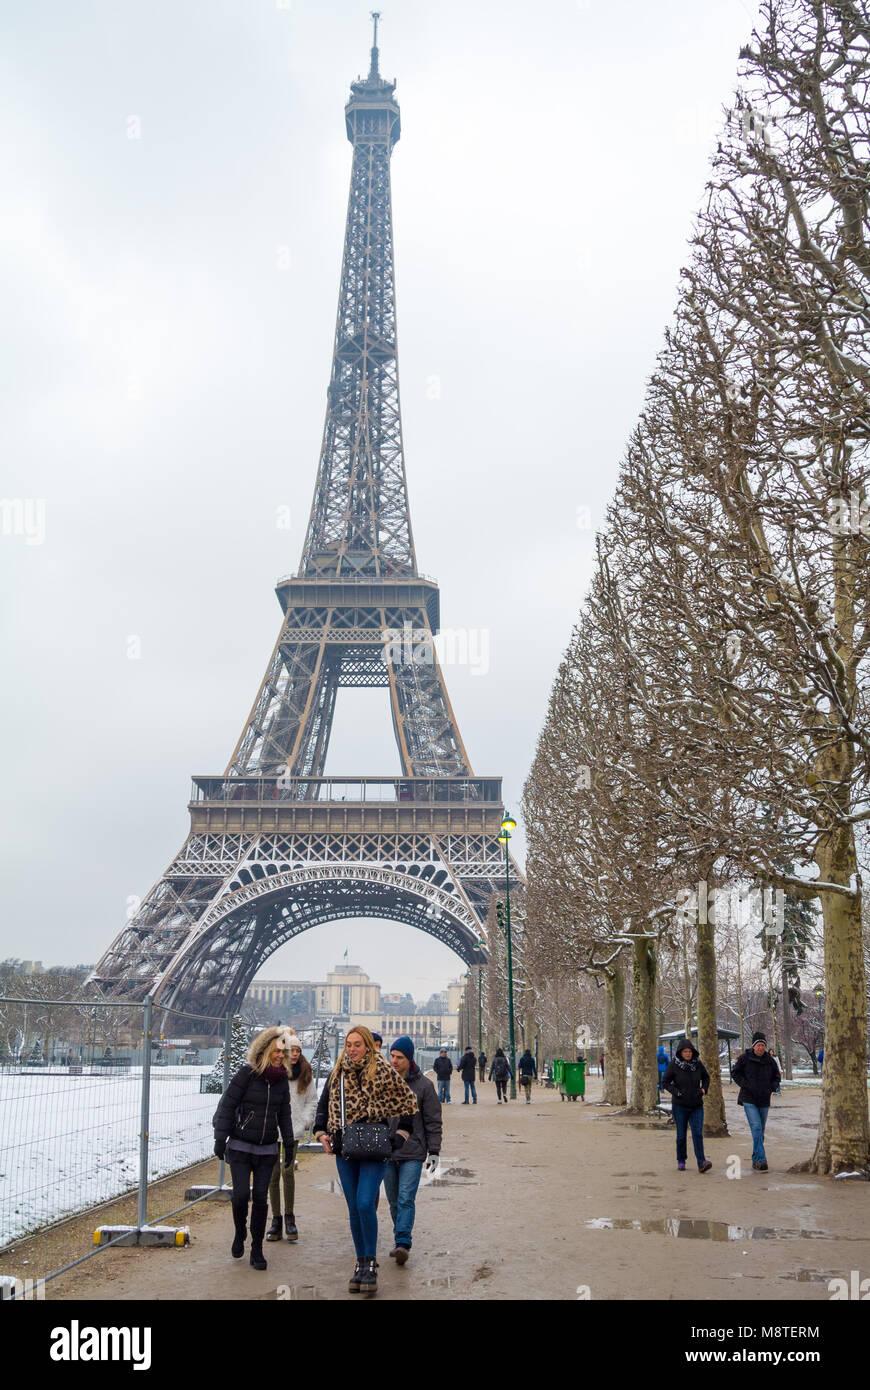 eiffel tower paris france - Stock Image